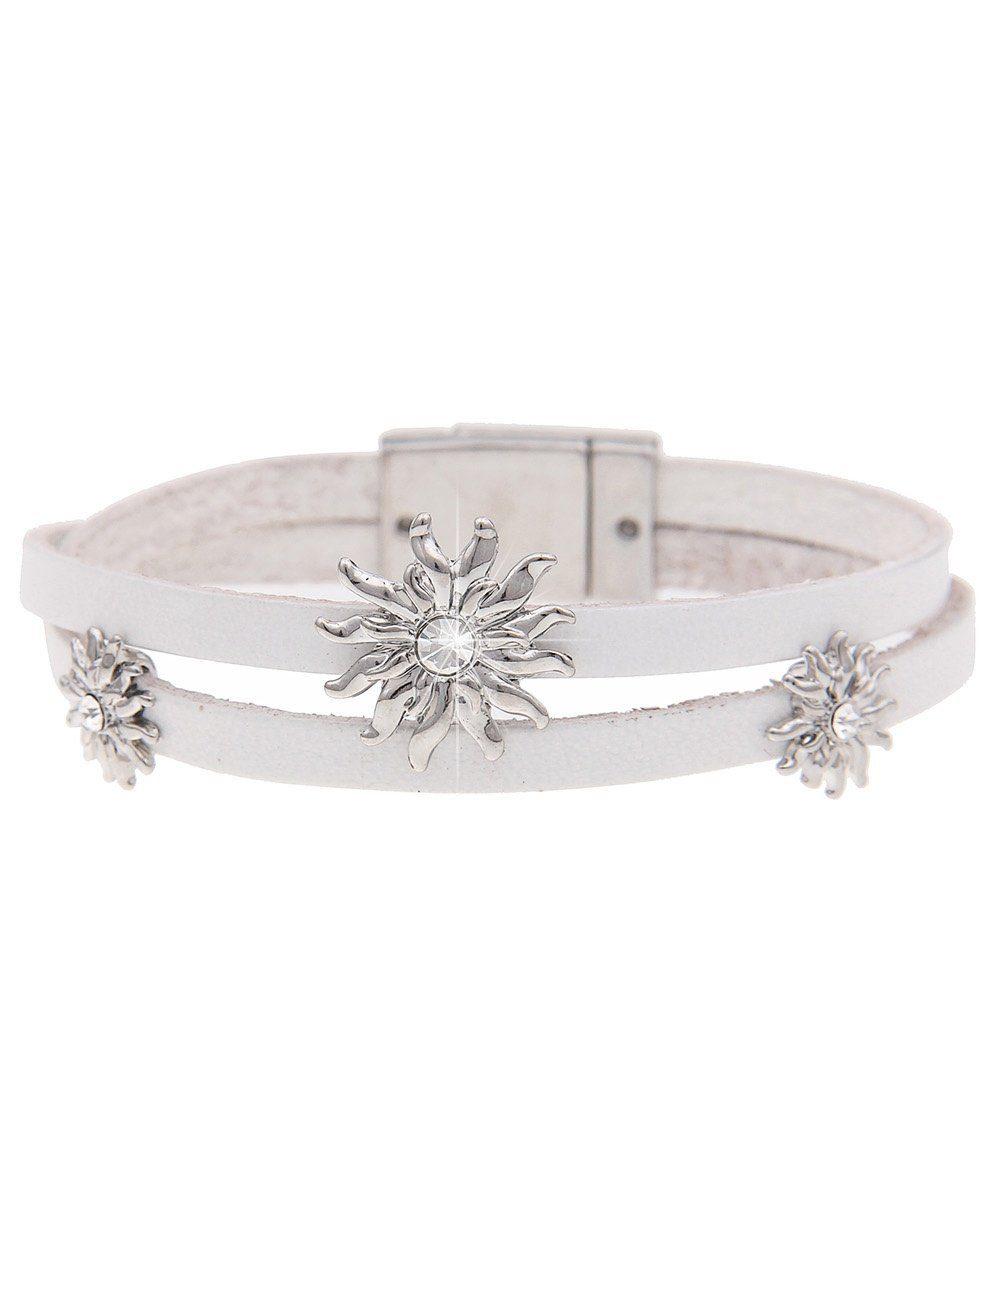 leslii Armband, mit Magnetverschluss silberfarben Damen Armband Armbänder Schmuck 4250980350695